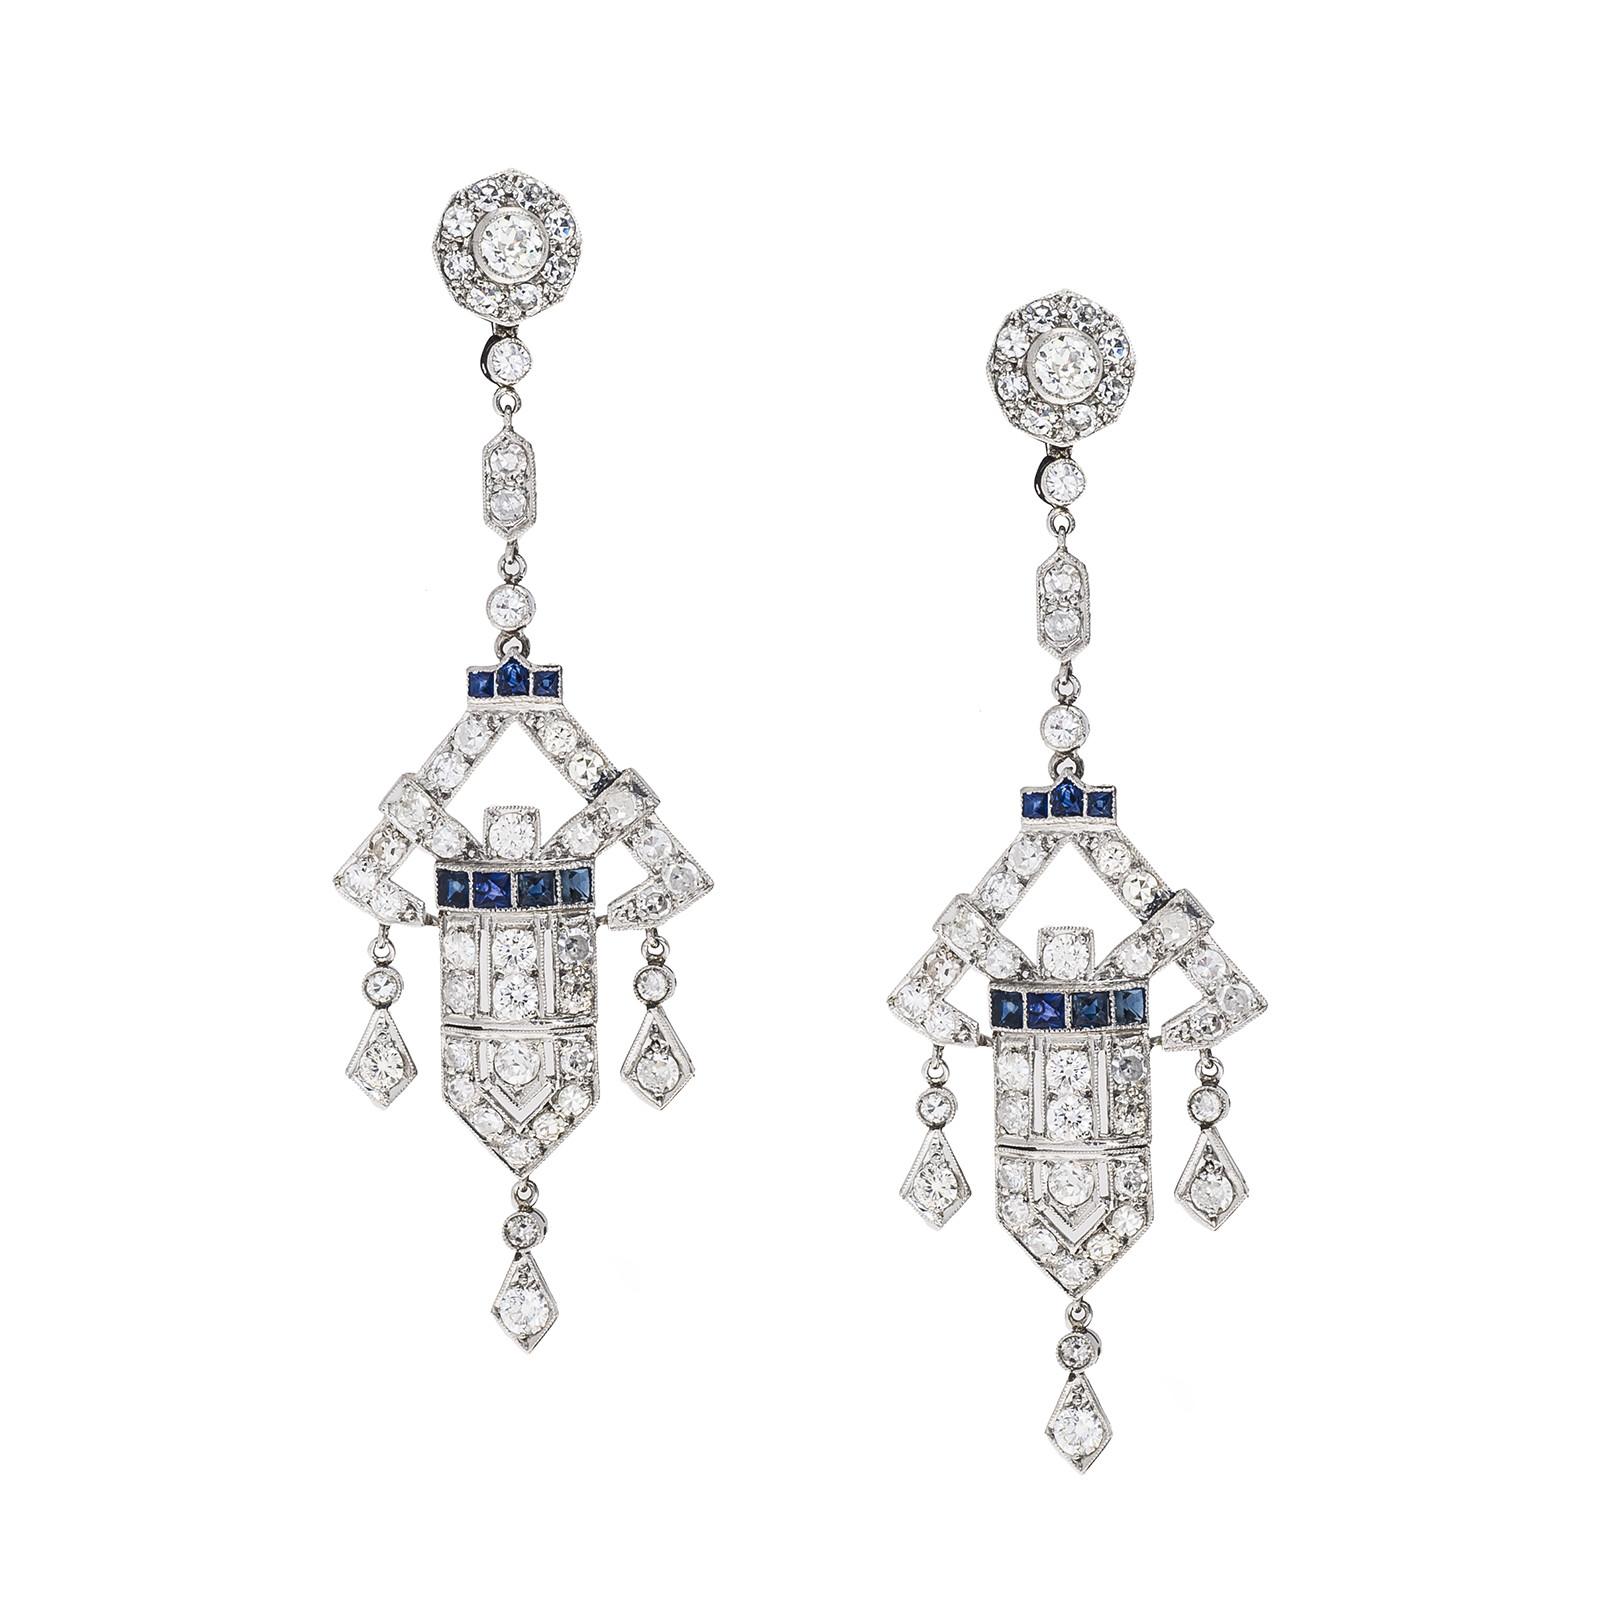 Vintage 3.64 CTW Diamond & Blue Sapphire Earrings